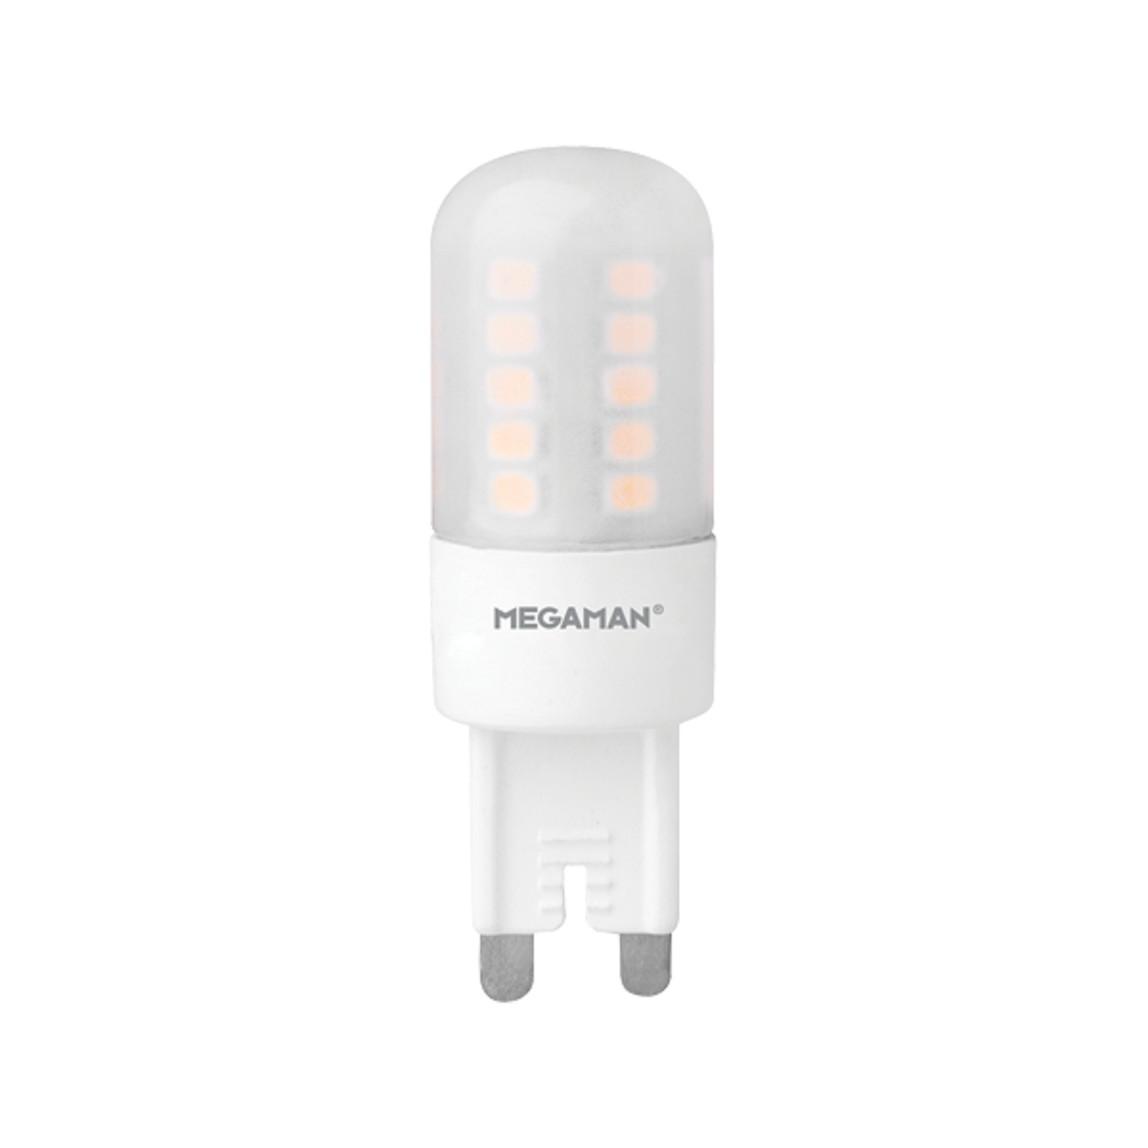 MEGAMAN LED G9 Ampul